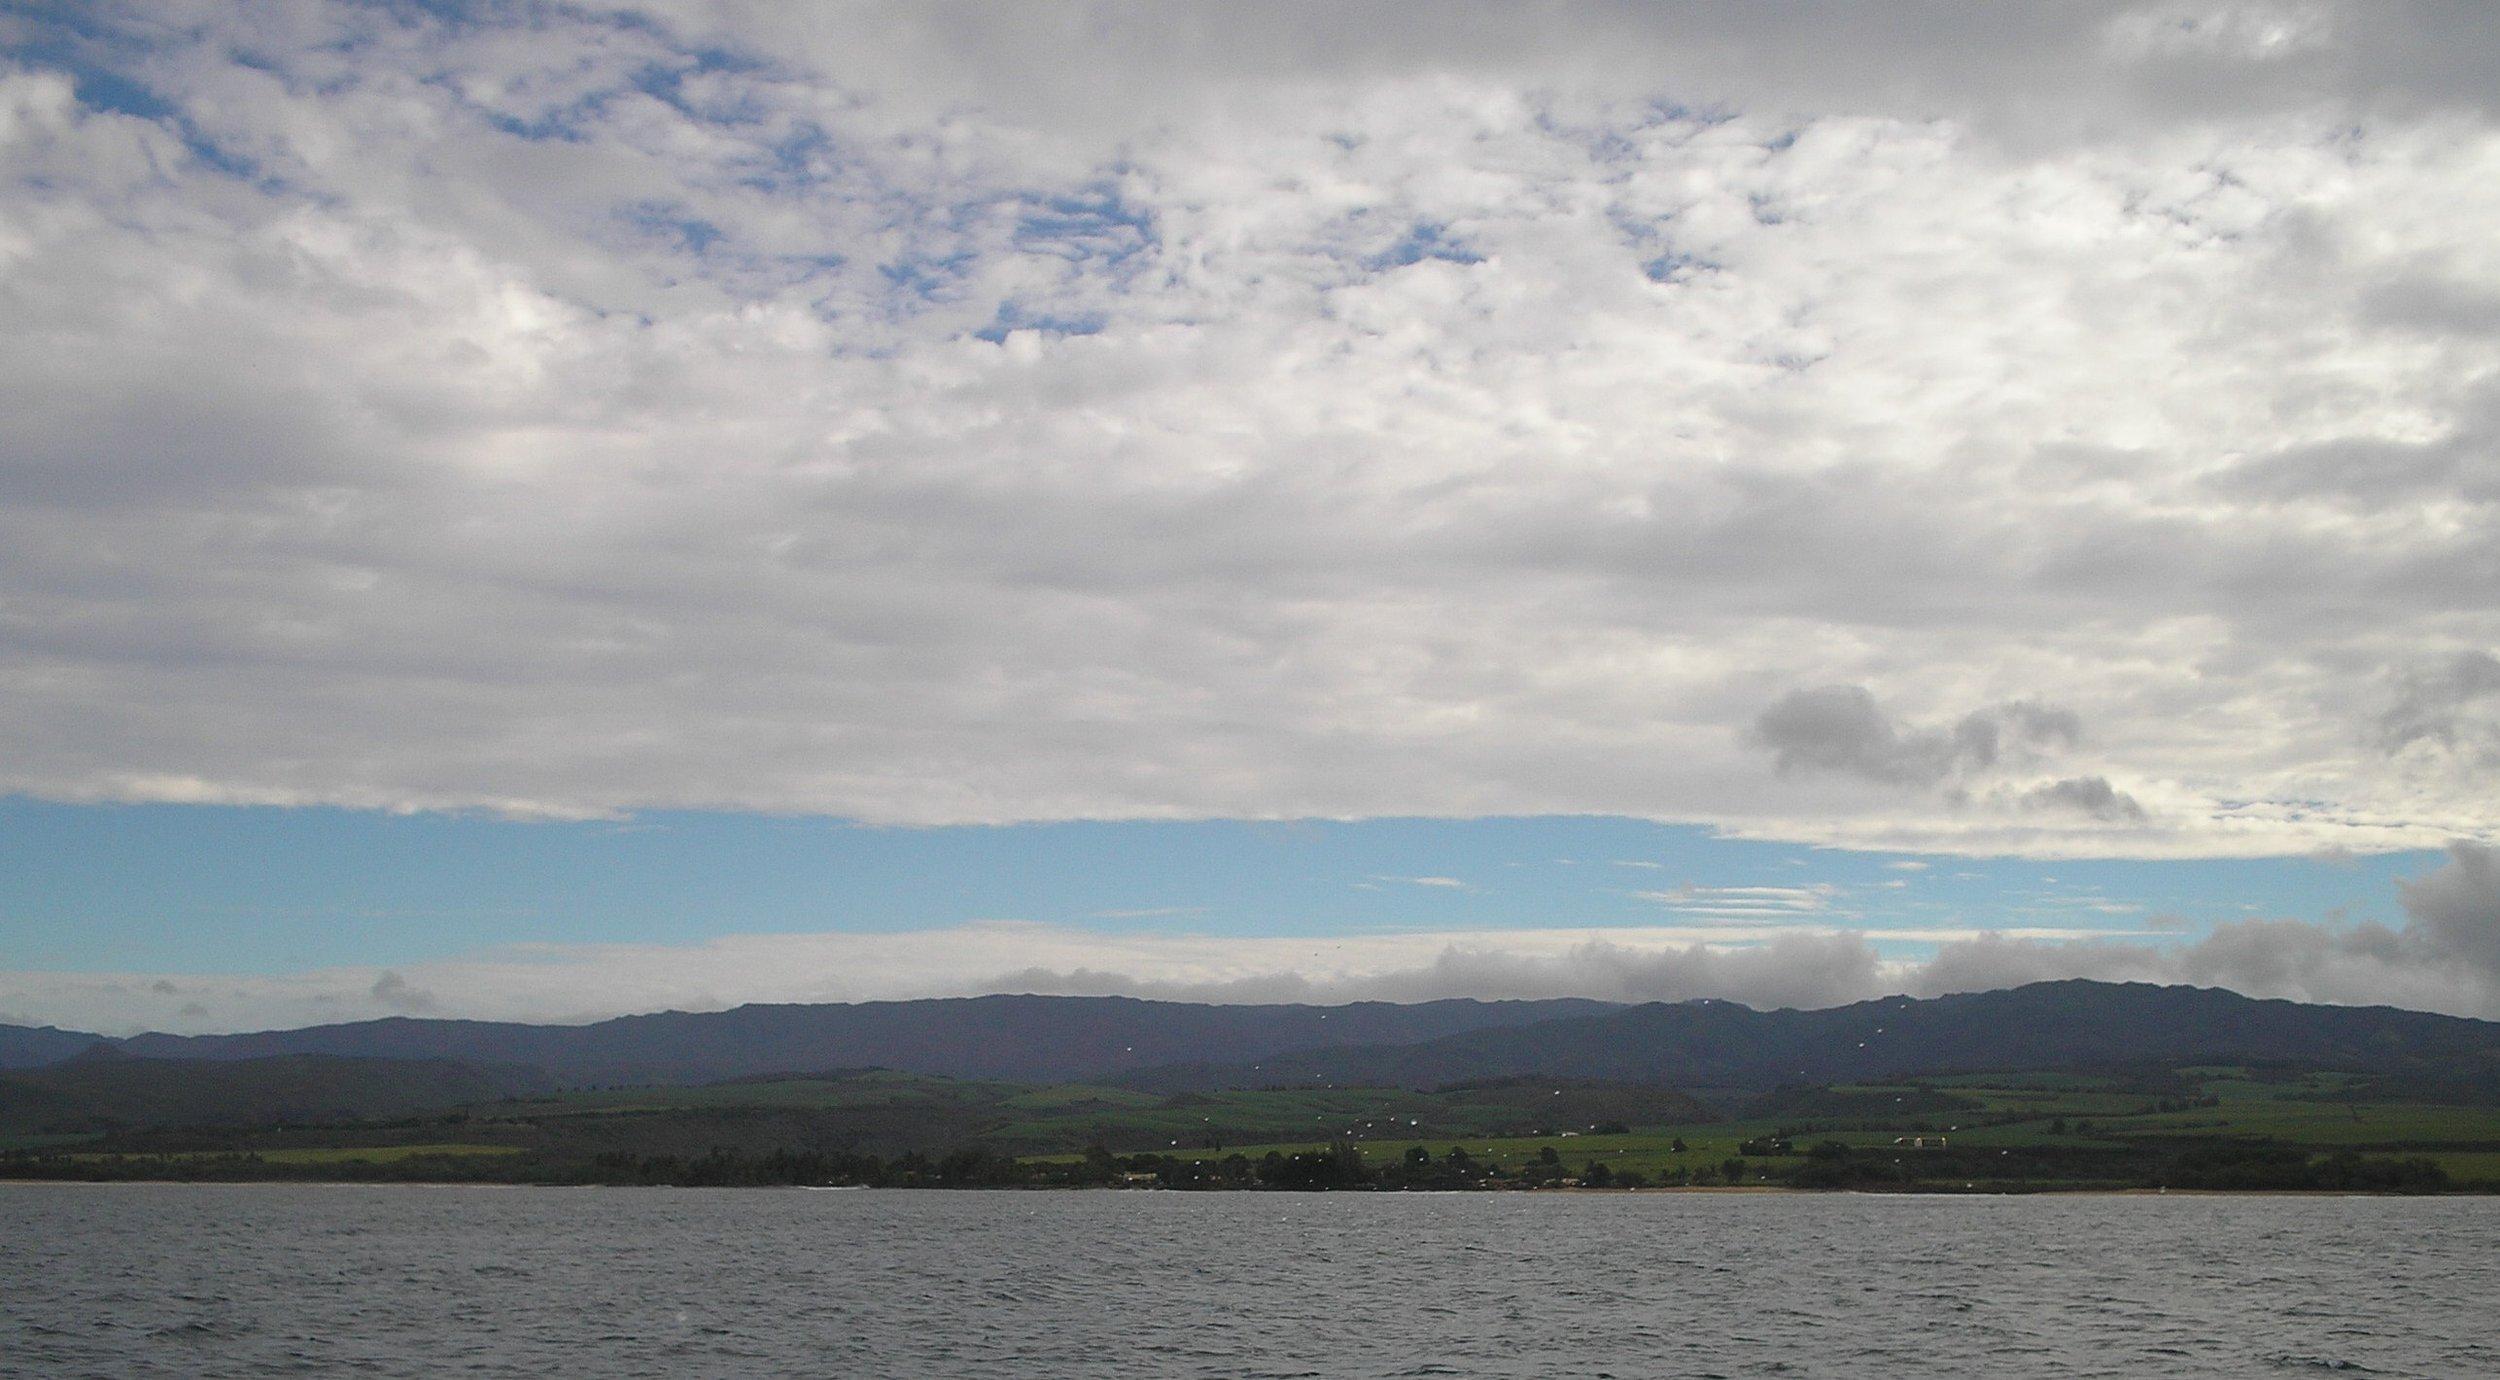 west side kauai from boat2.jpg